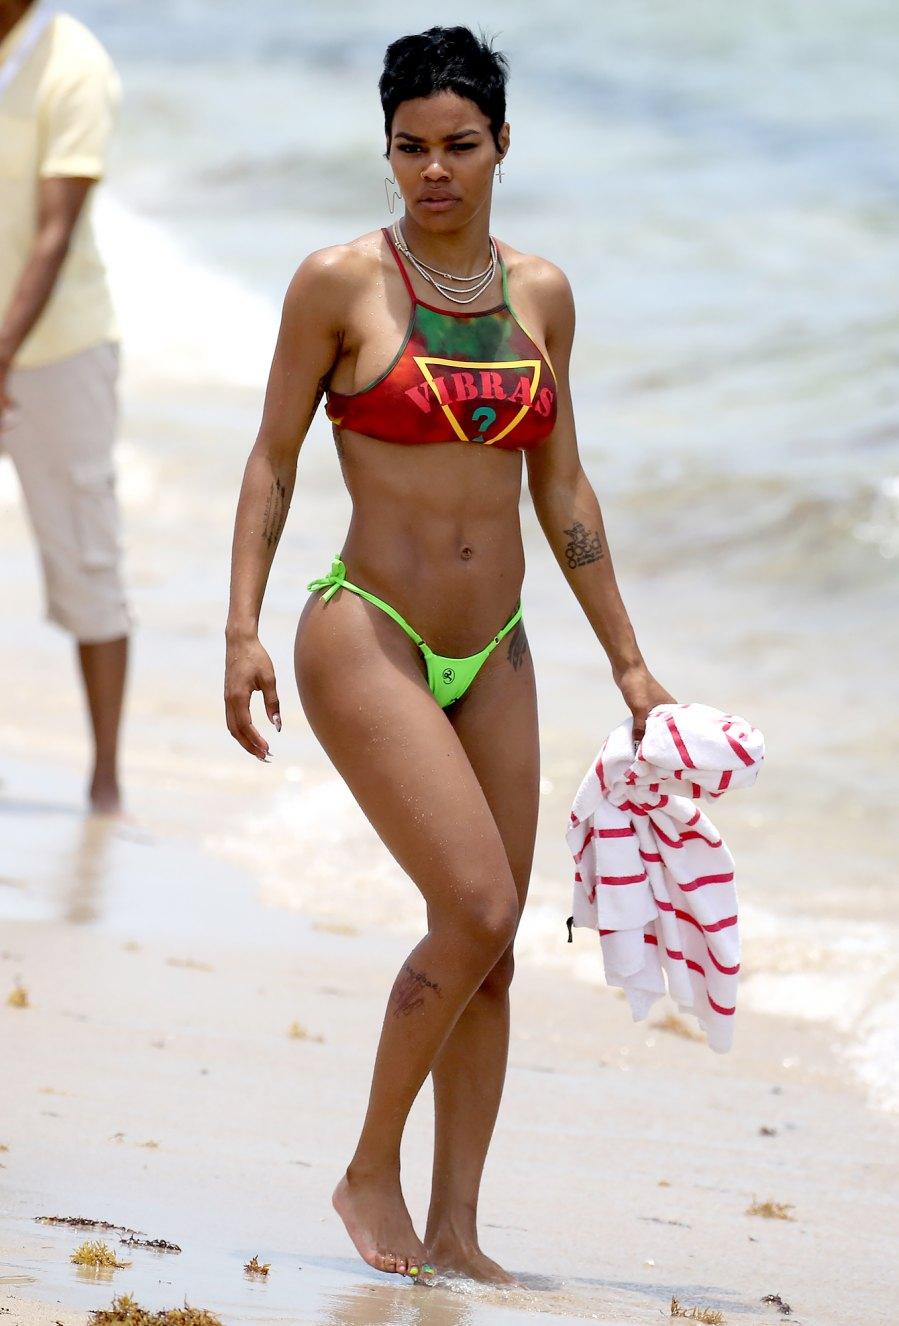 Teyana-Taylor-bikini-4th-of-july